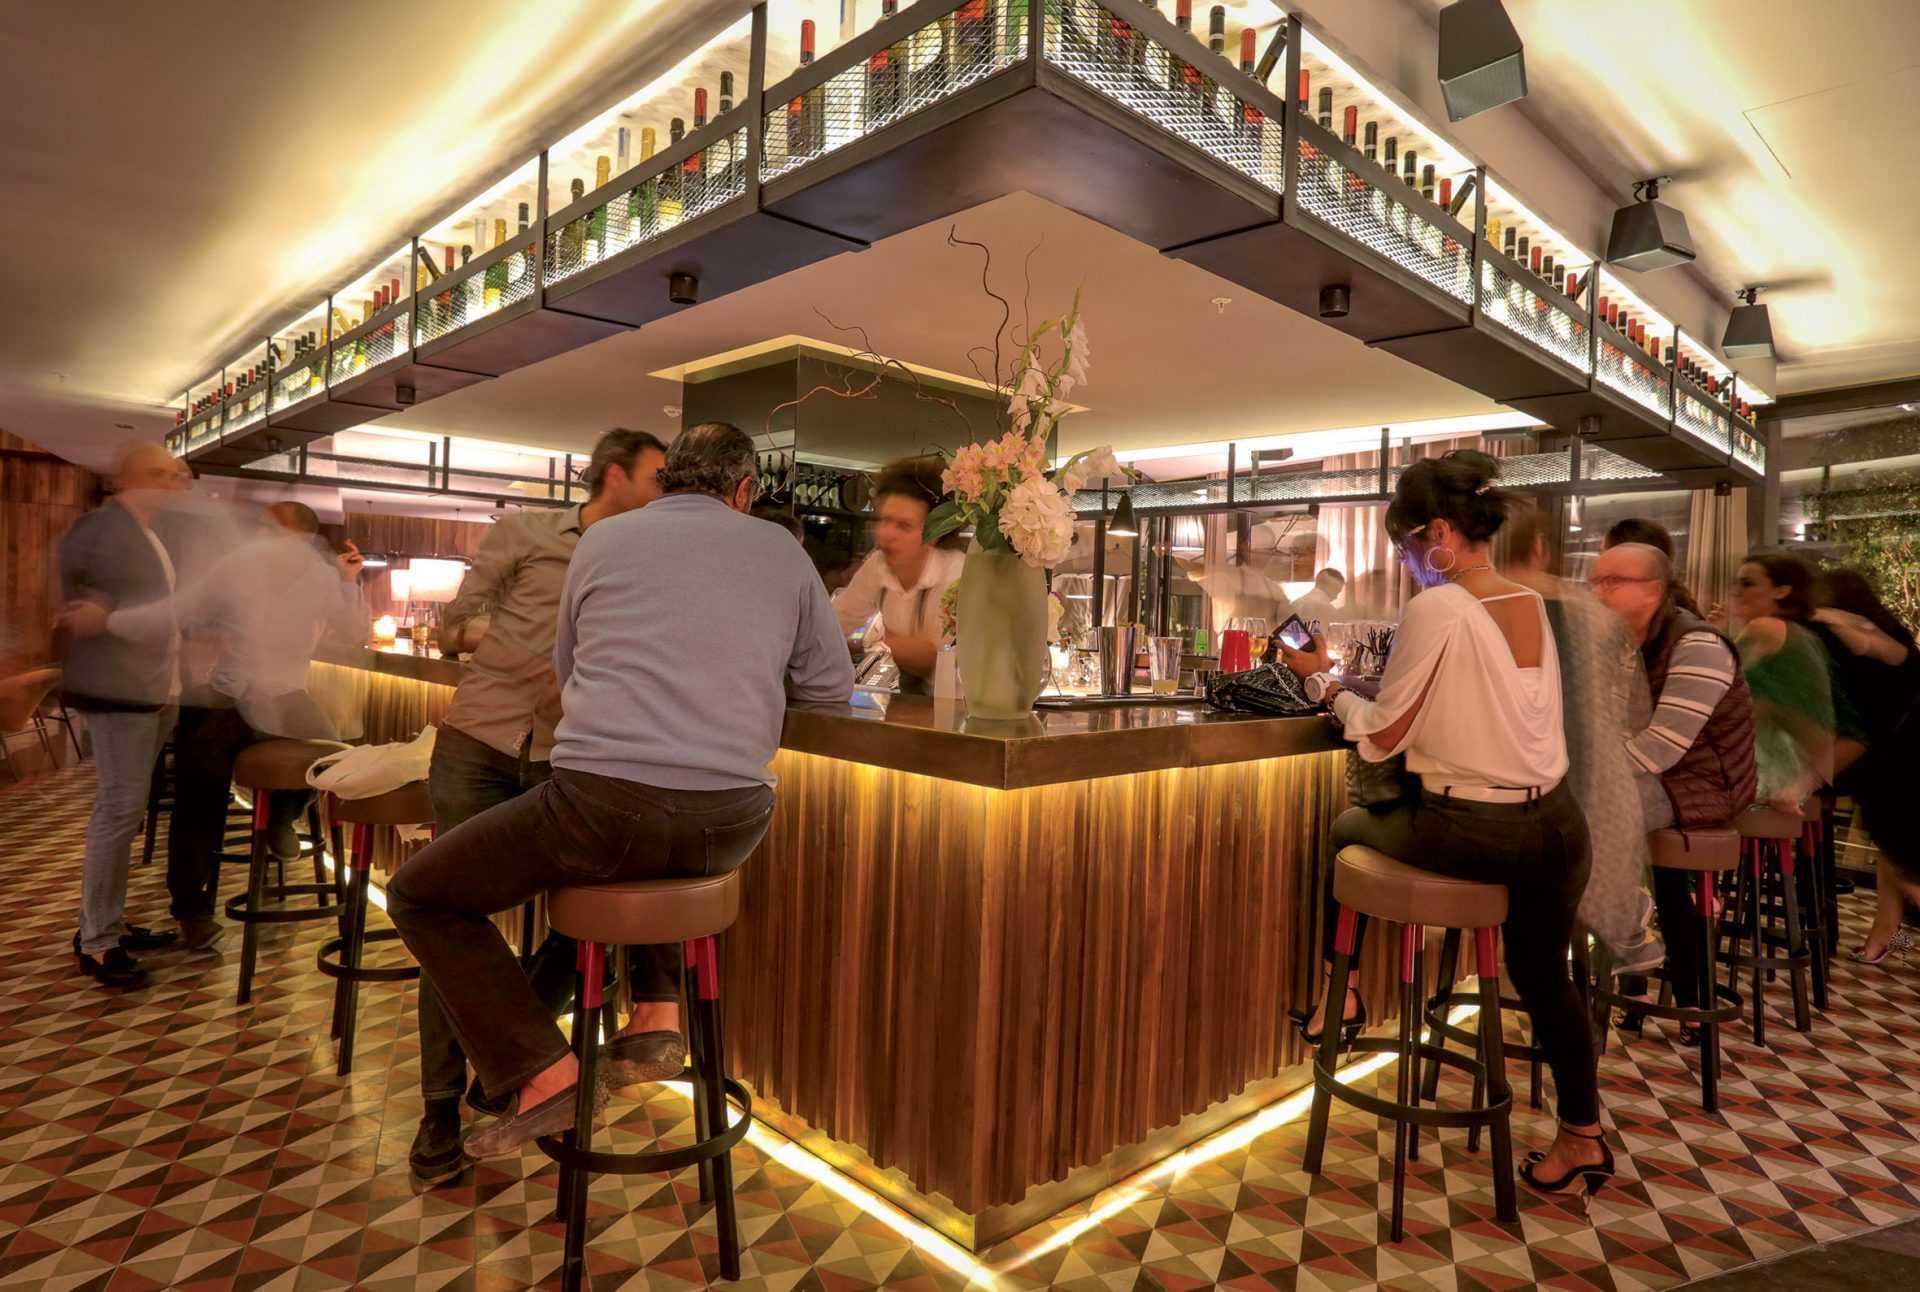 BIENVENUE AU RADISSON BLU : un hôtel design, chic et 100% urbain